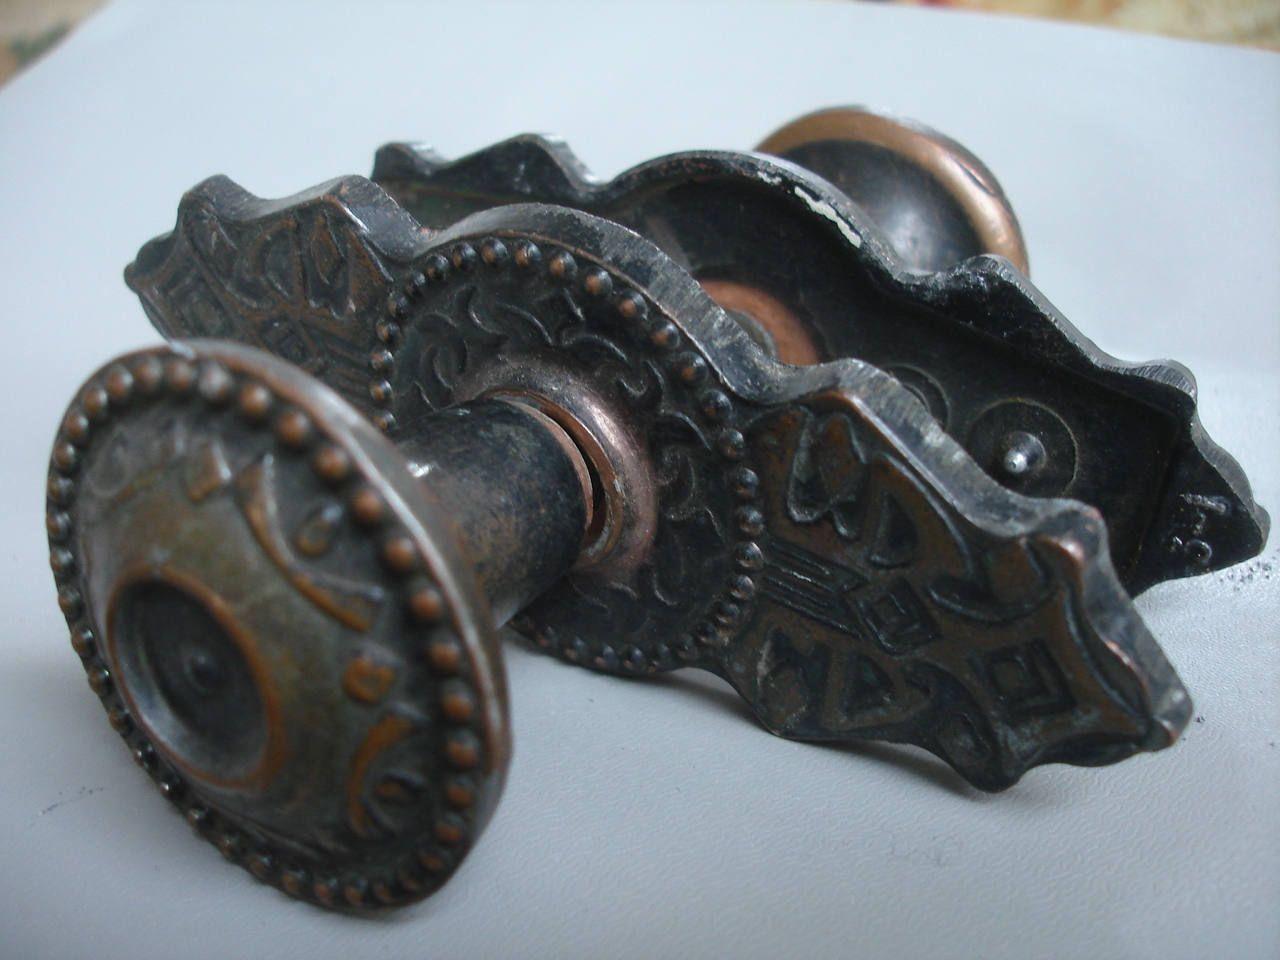 Set Of 2 Vintage Metal Door Knobs, Round Knobs, Vintage Beautiful Metal  Door Knobs